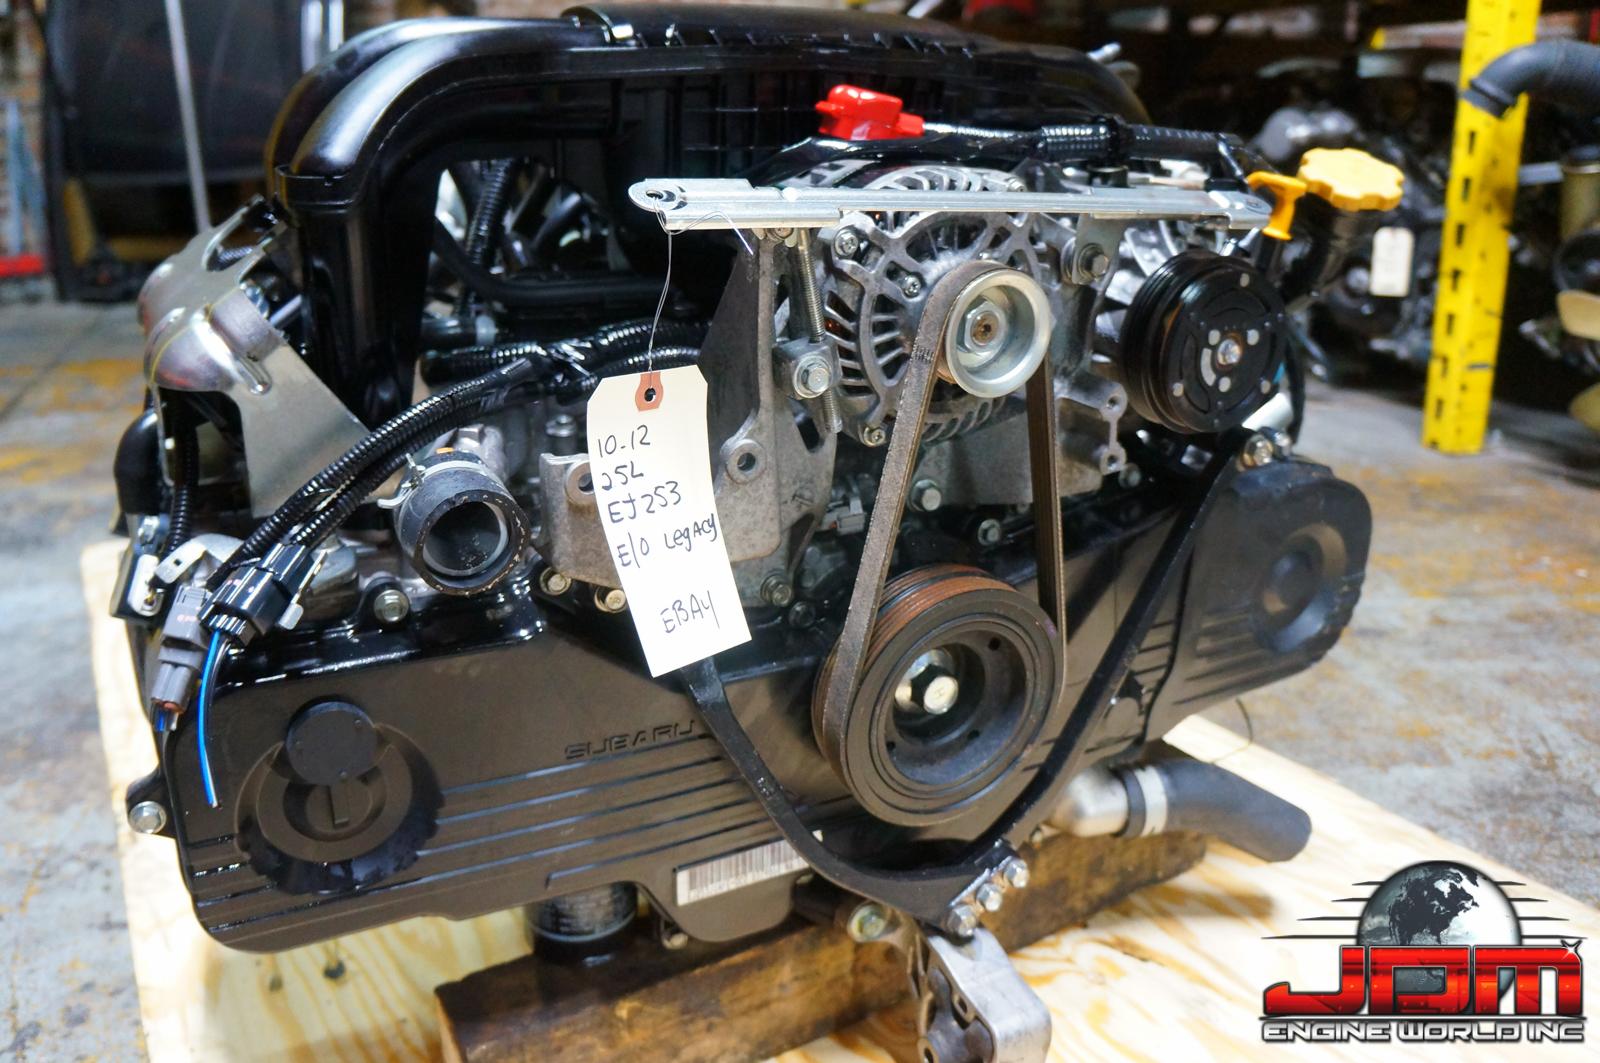 10 11 12 SUBARU LEGACY OUTBACK FORESTER EJ25 ENGINE ONLY 2.5L SOHC JDM EJ25